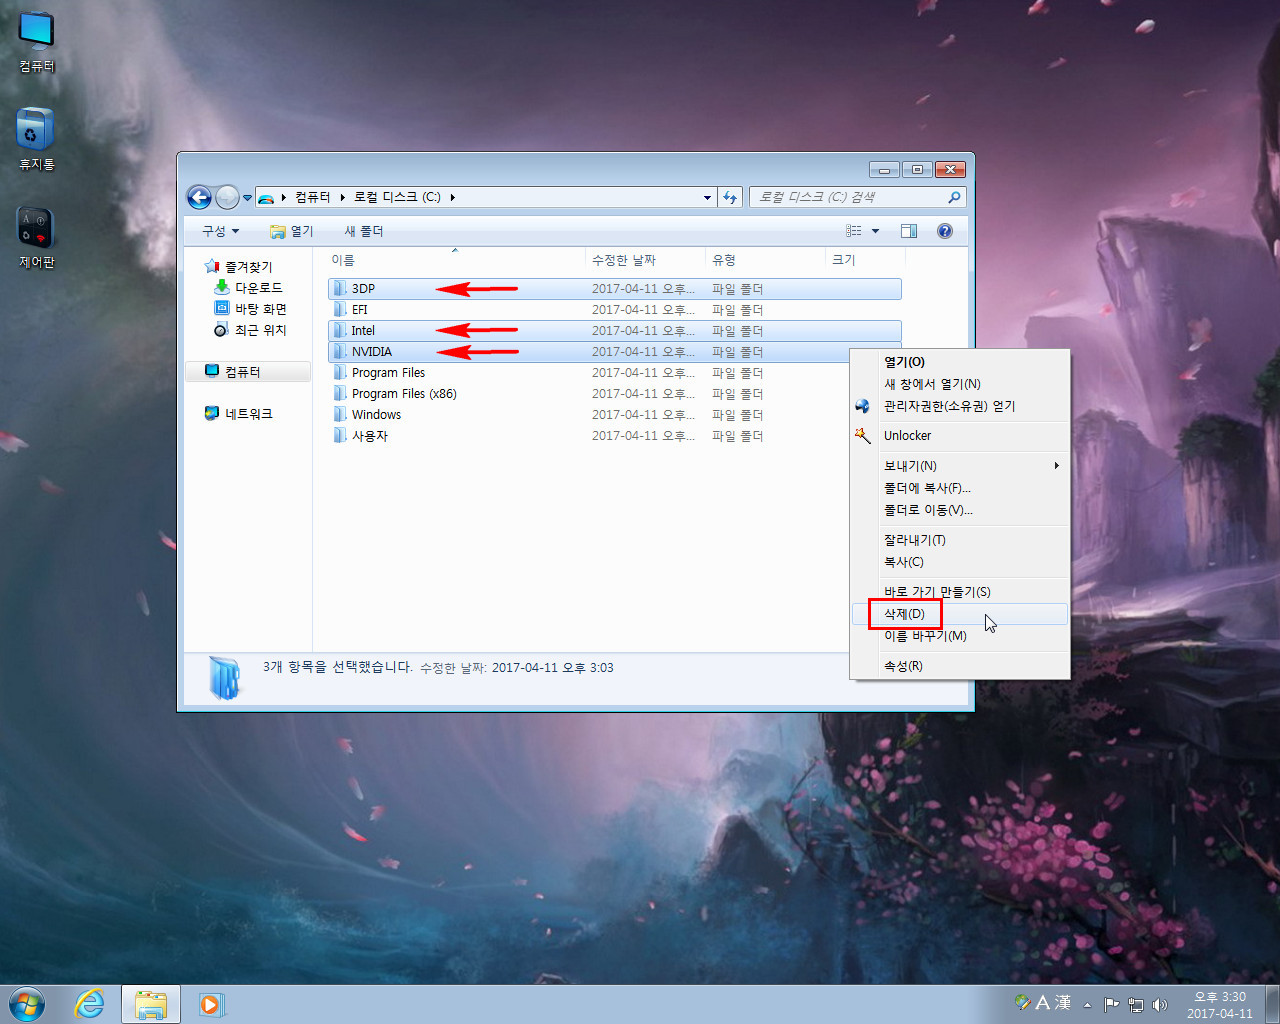 Windows 7 Ultimate_x64_Lite_KO_KY_OldMaC16.jpg